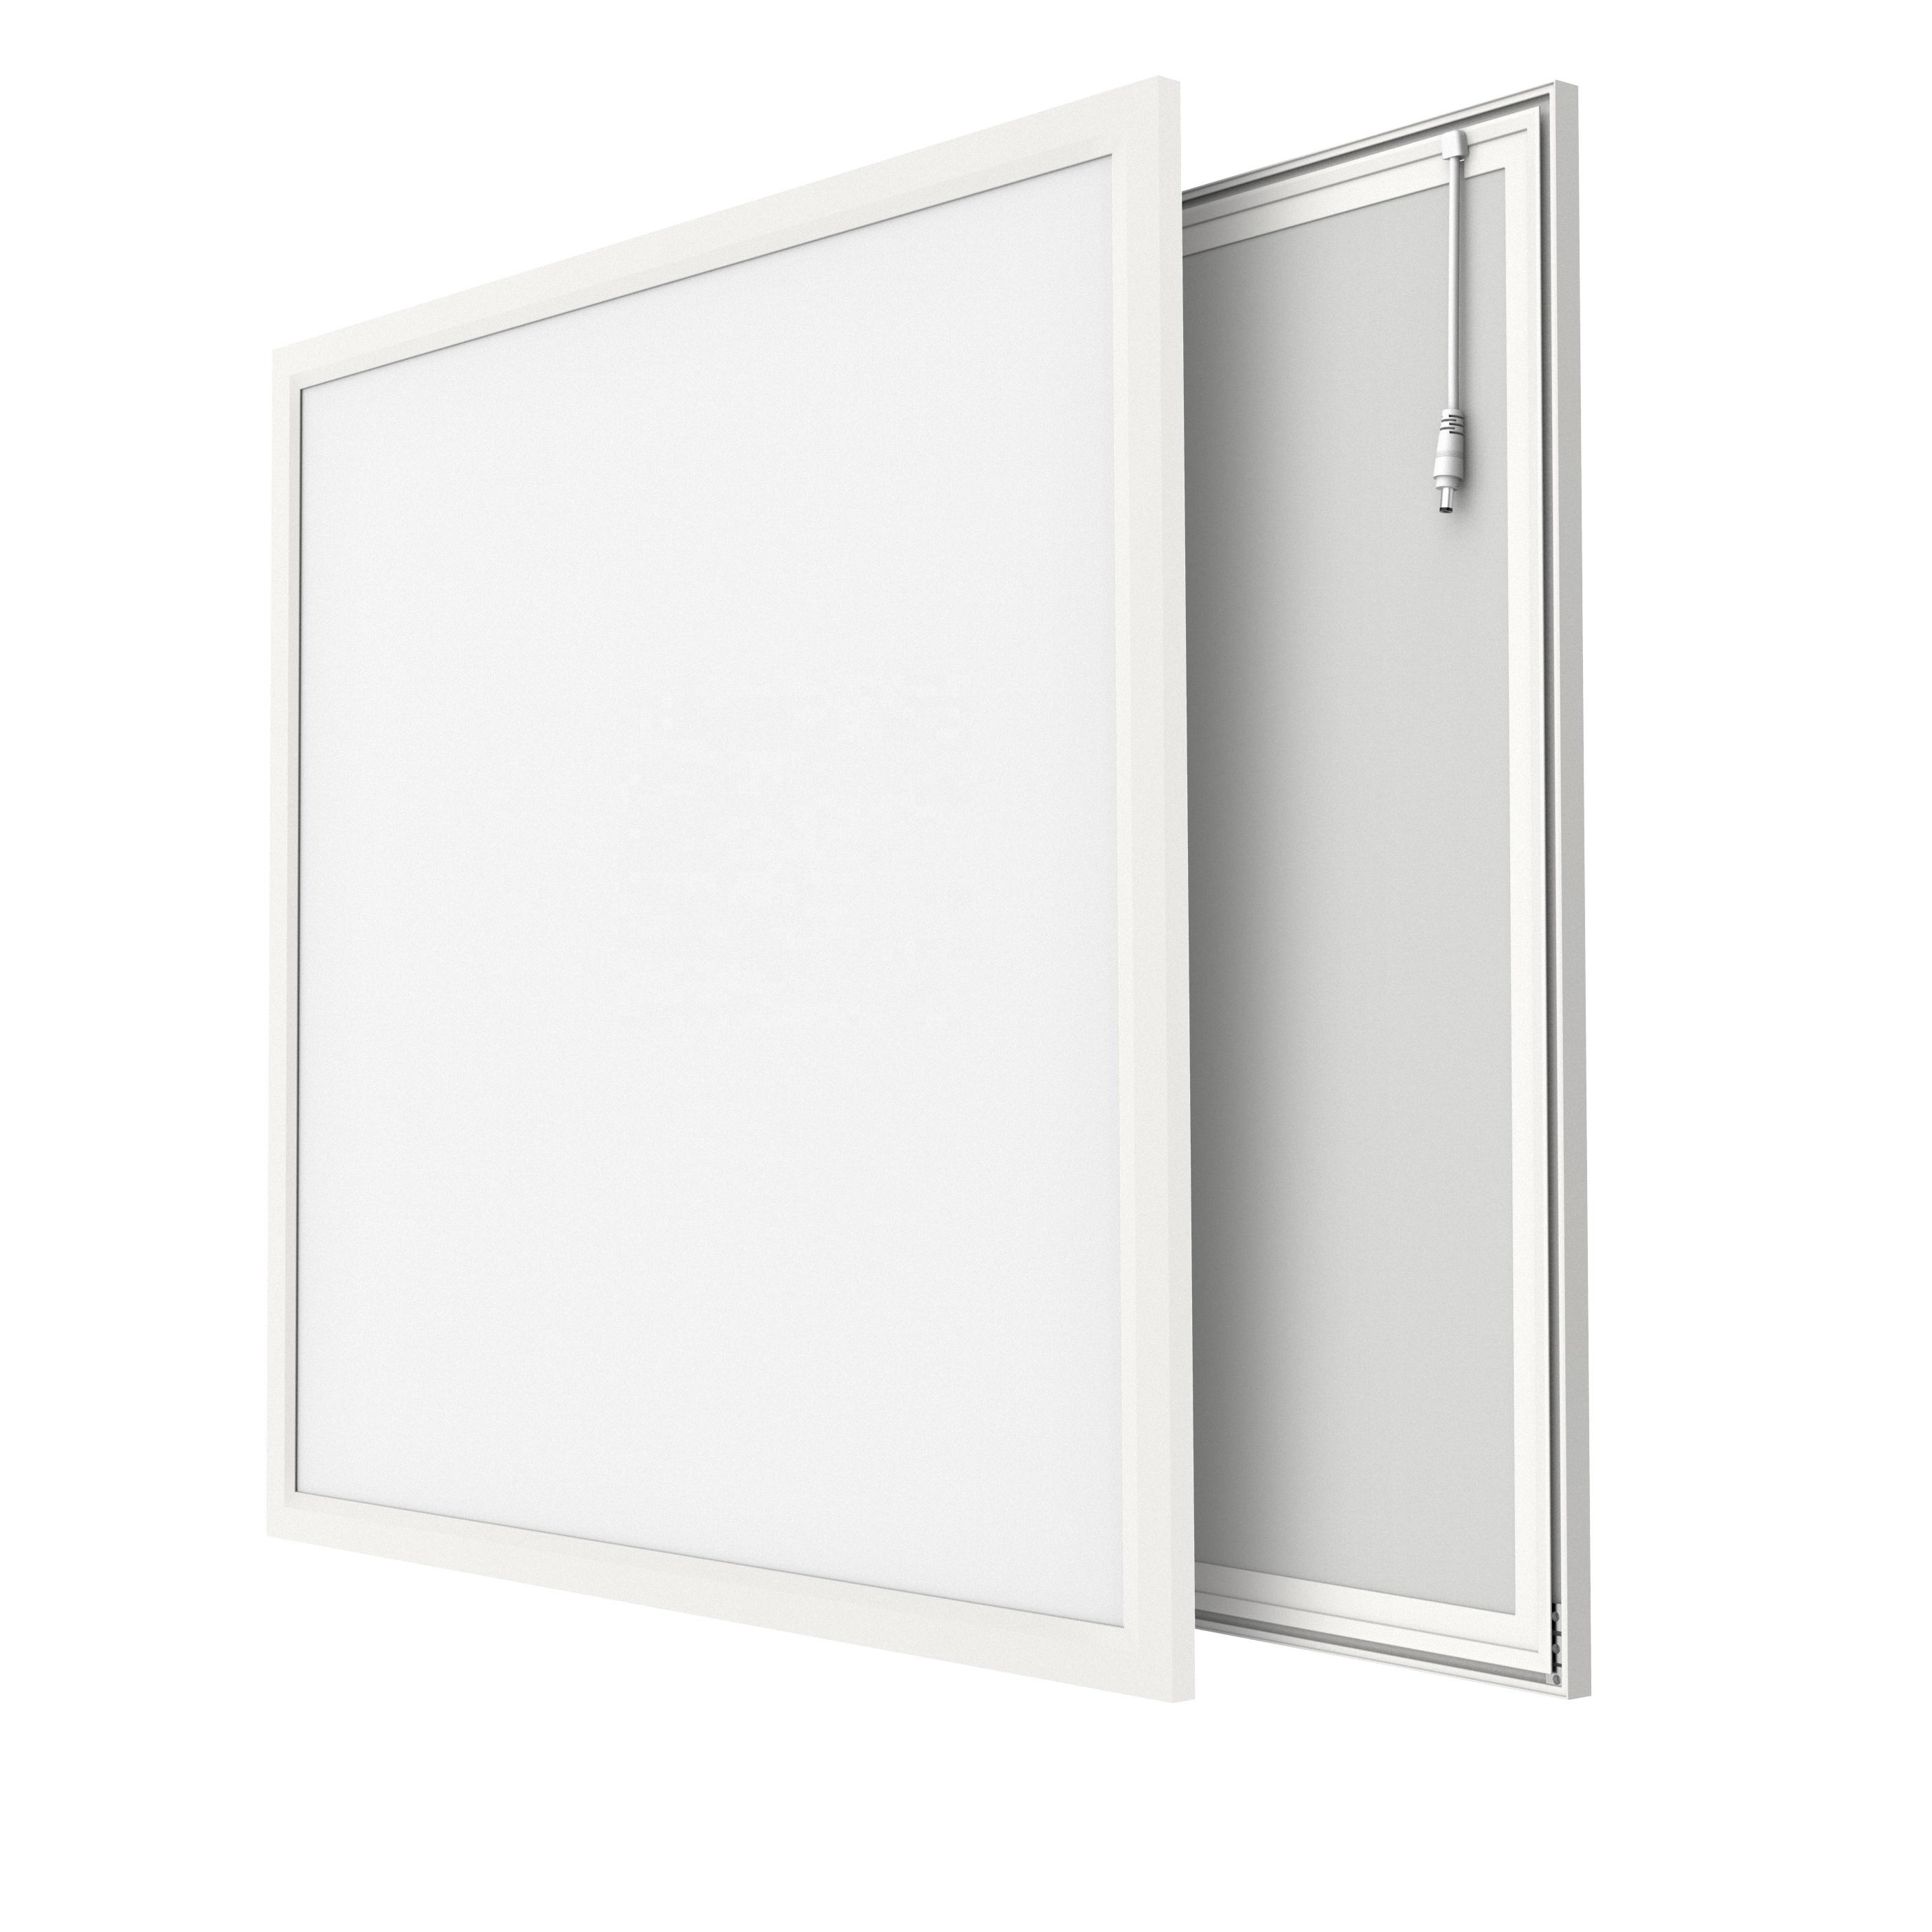 Zerun High quality 6060 40W 4000K 100LPW Ceiling recessed Edge-lit TUV GS CE RoHS LED panel light 60x60 Slim flat panel